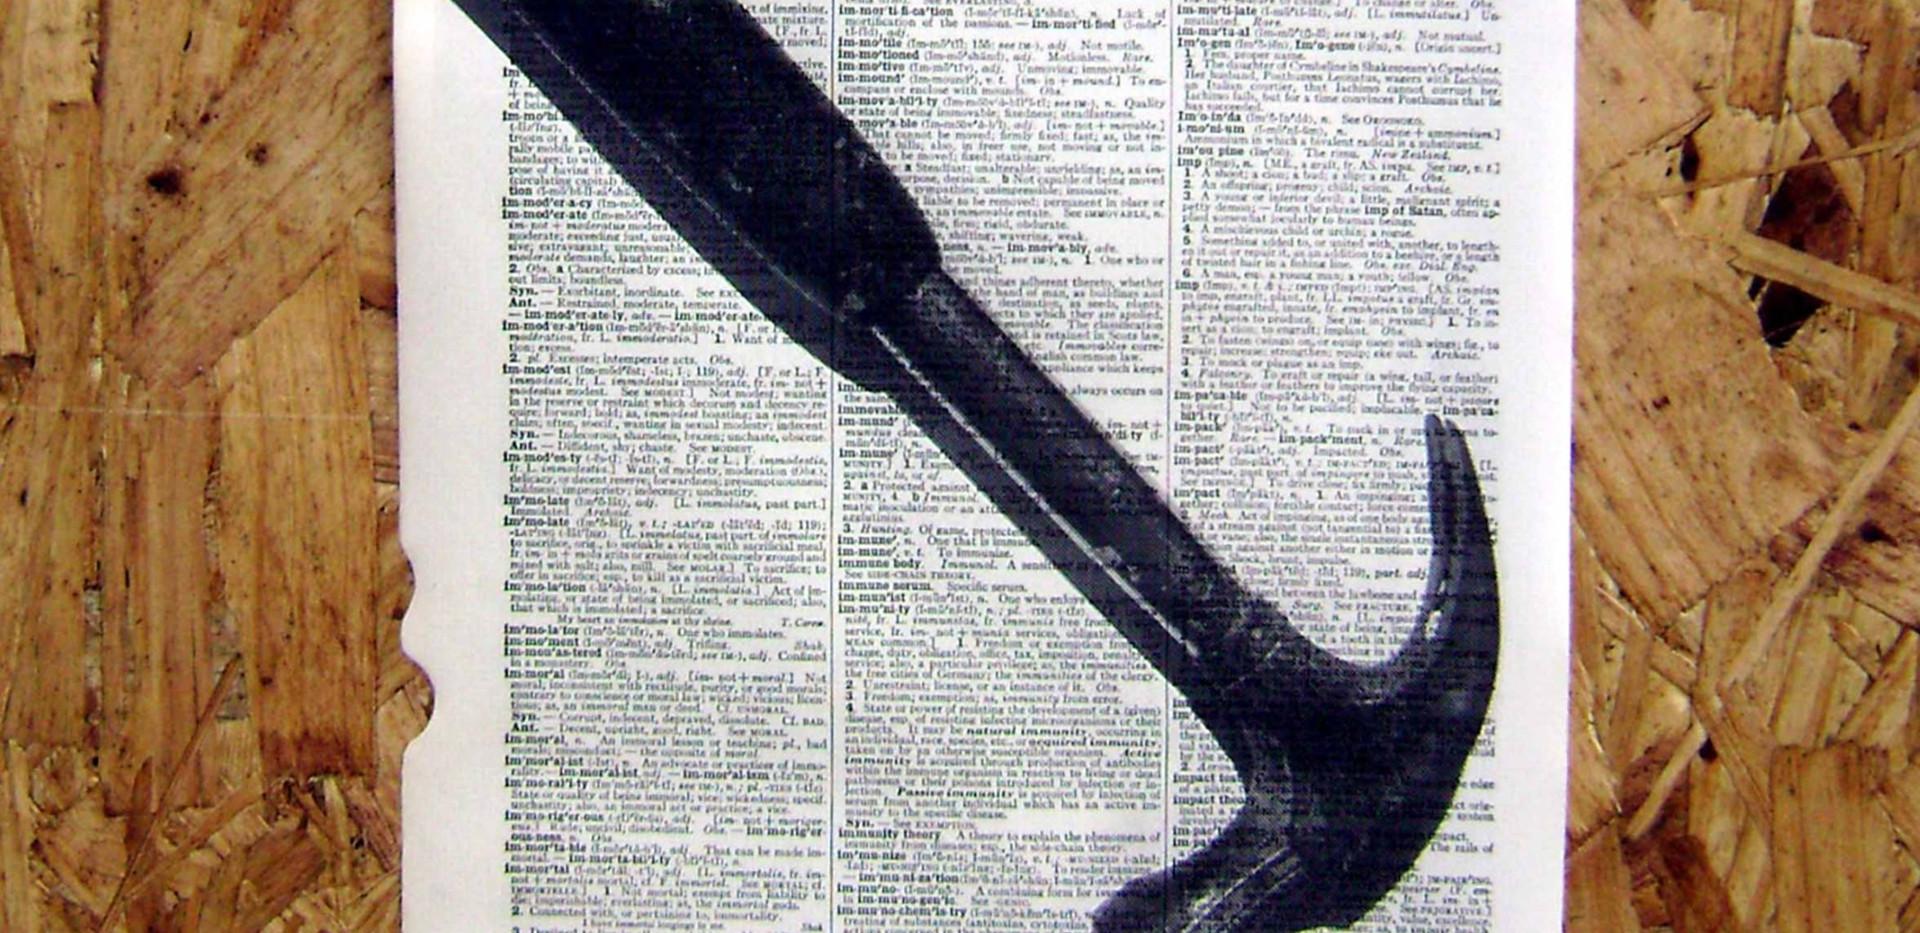 Common Object - Utilitarian 11